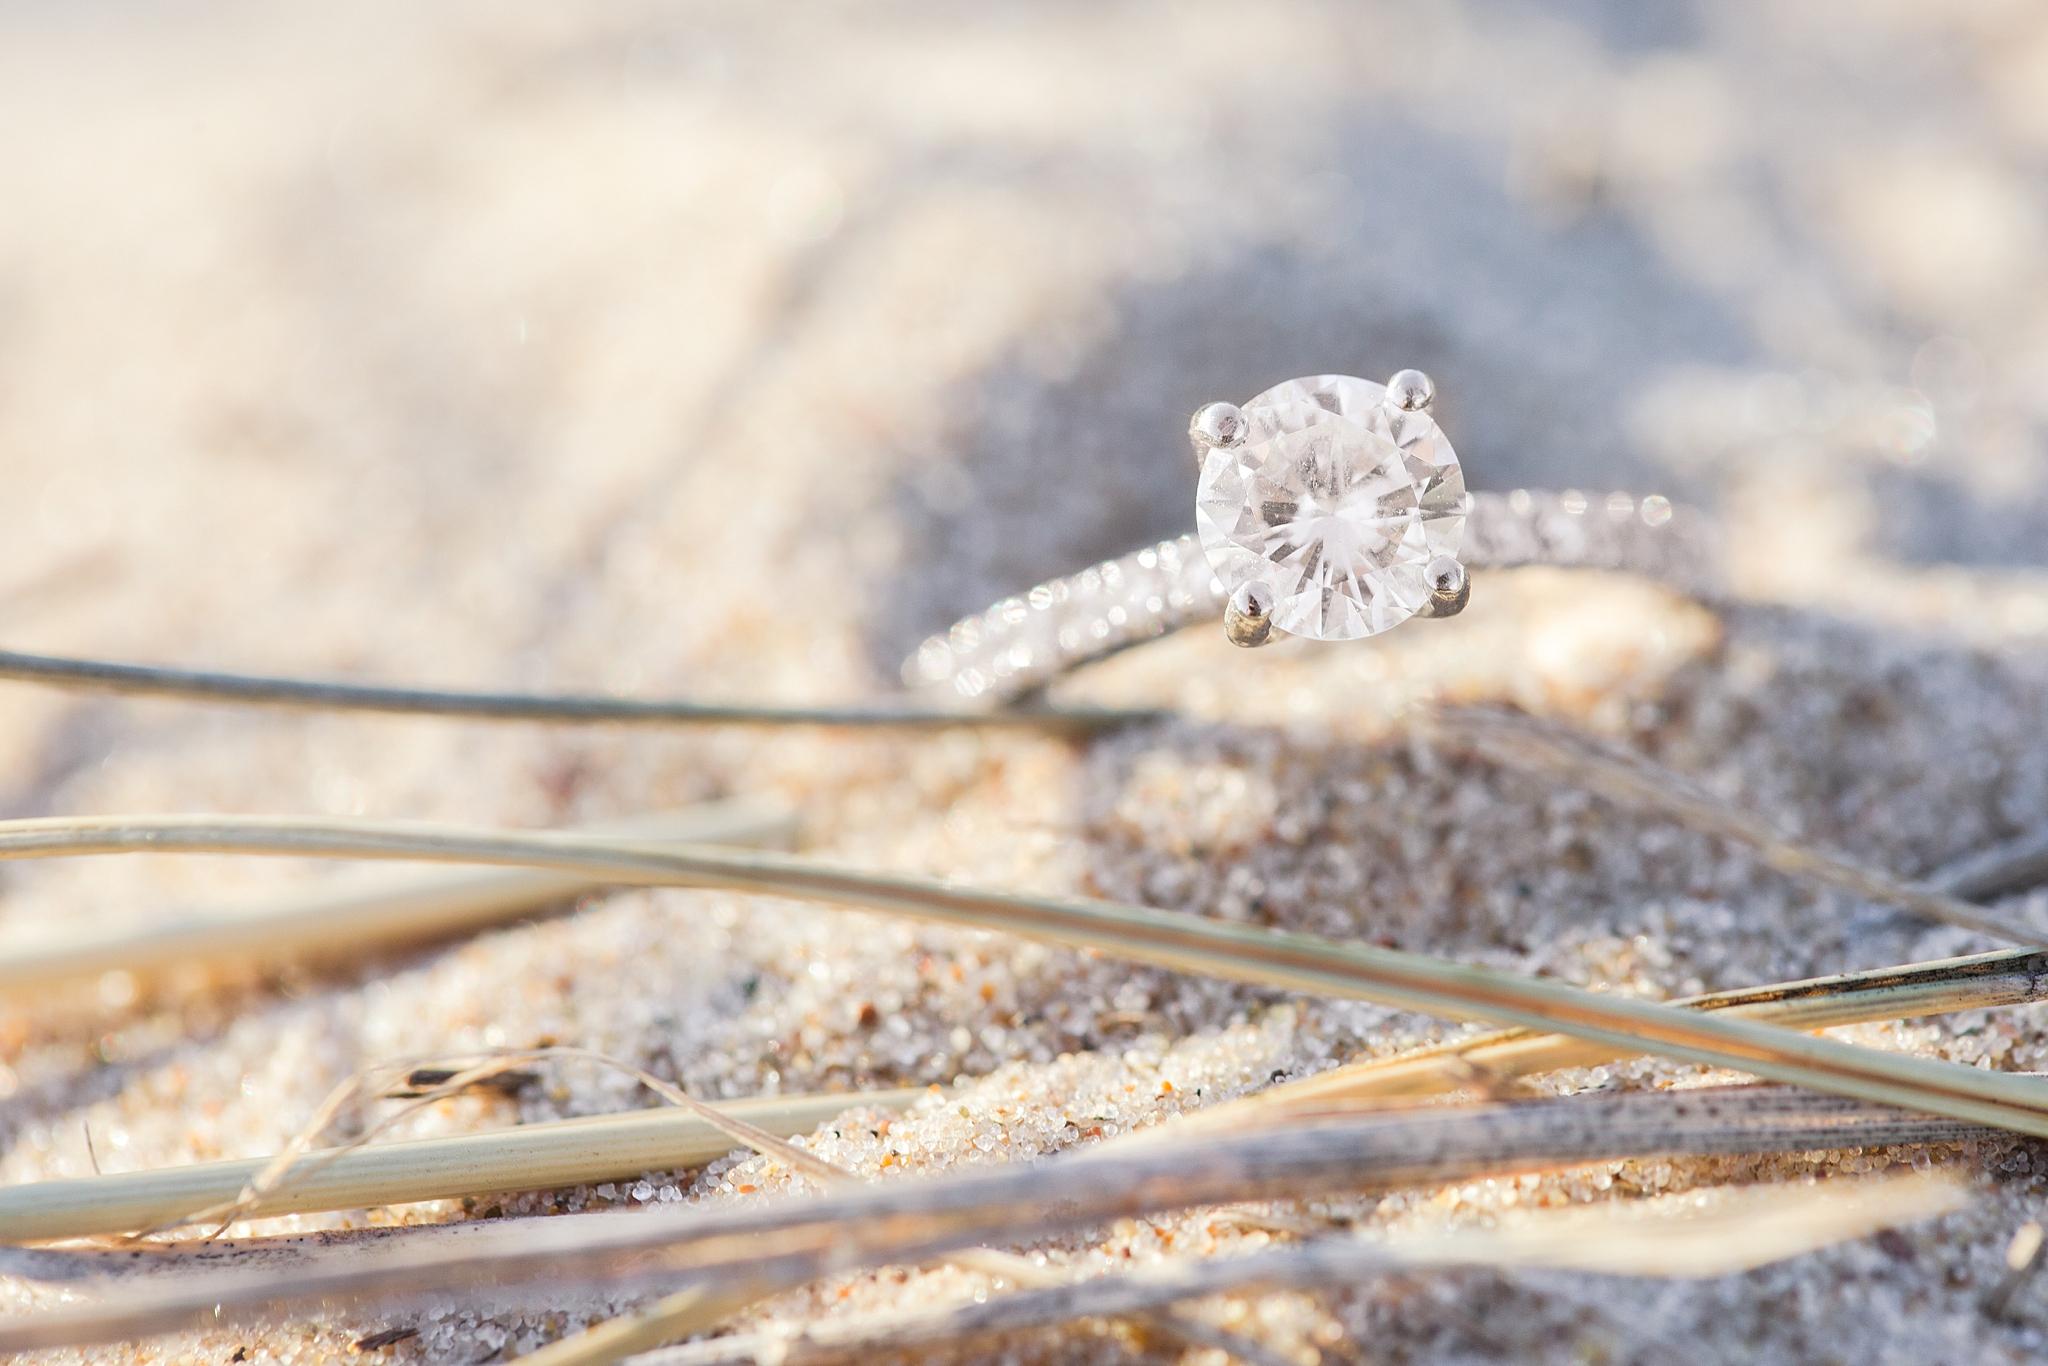 romantic--summer-beach-engagement-photography-in-st-joseph-mi-by-courtney-carolyn-photography_0006.jpg